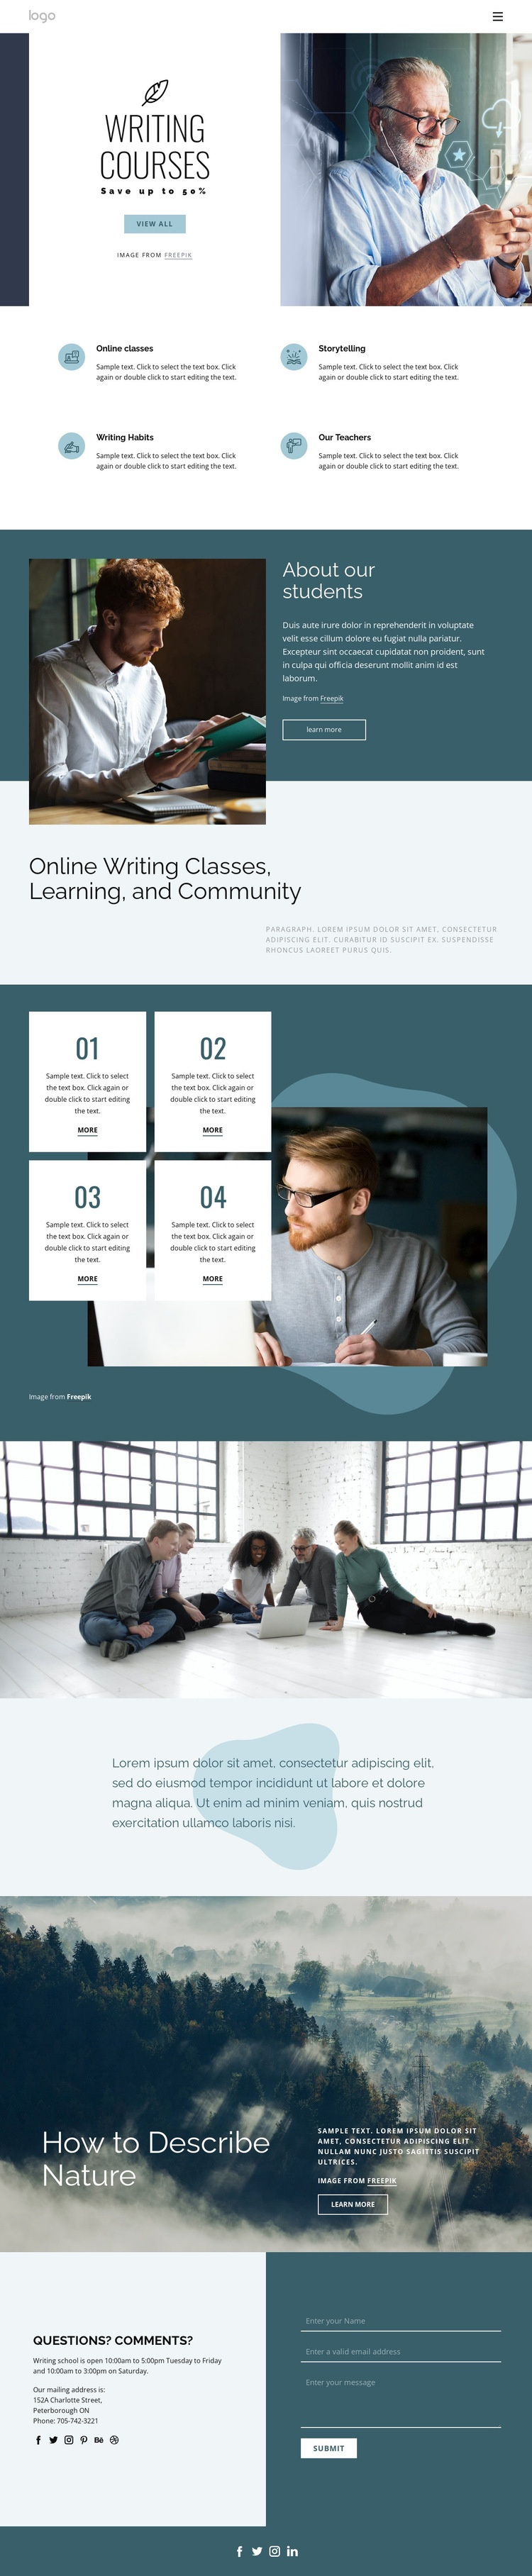 Creative writing courses Html Code Example